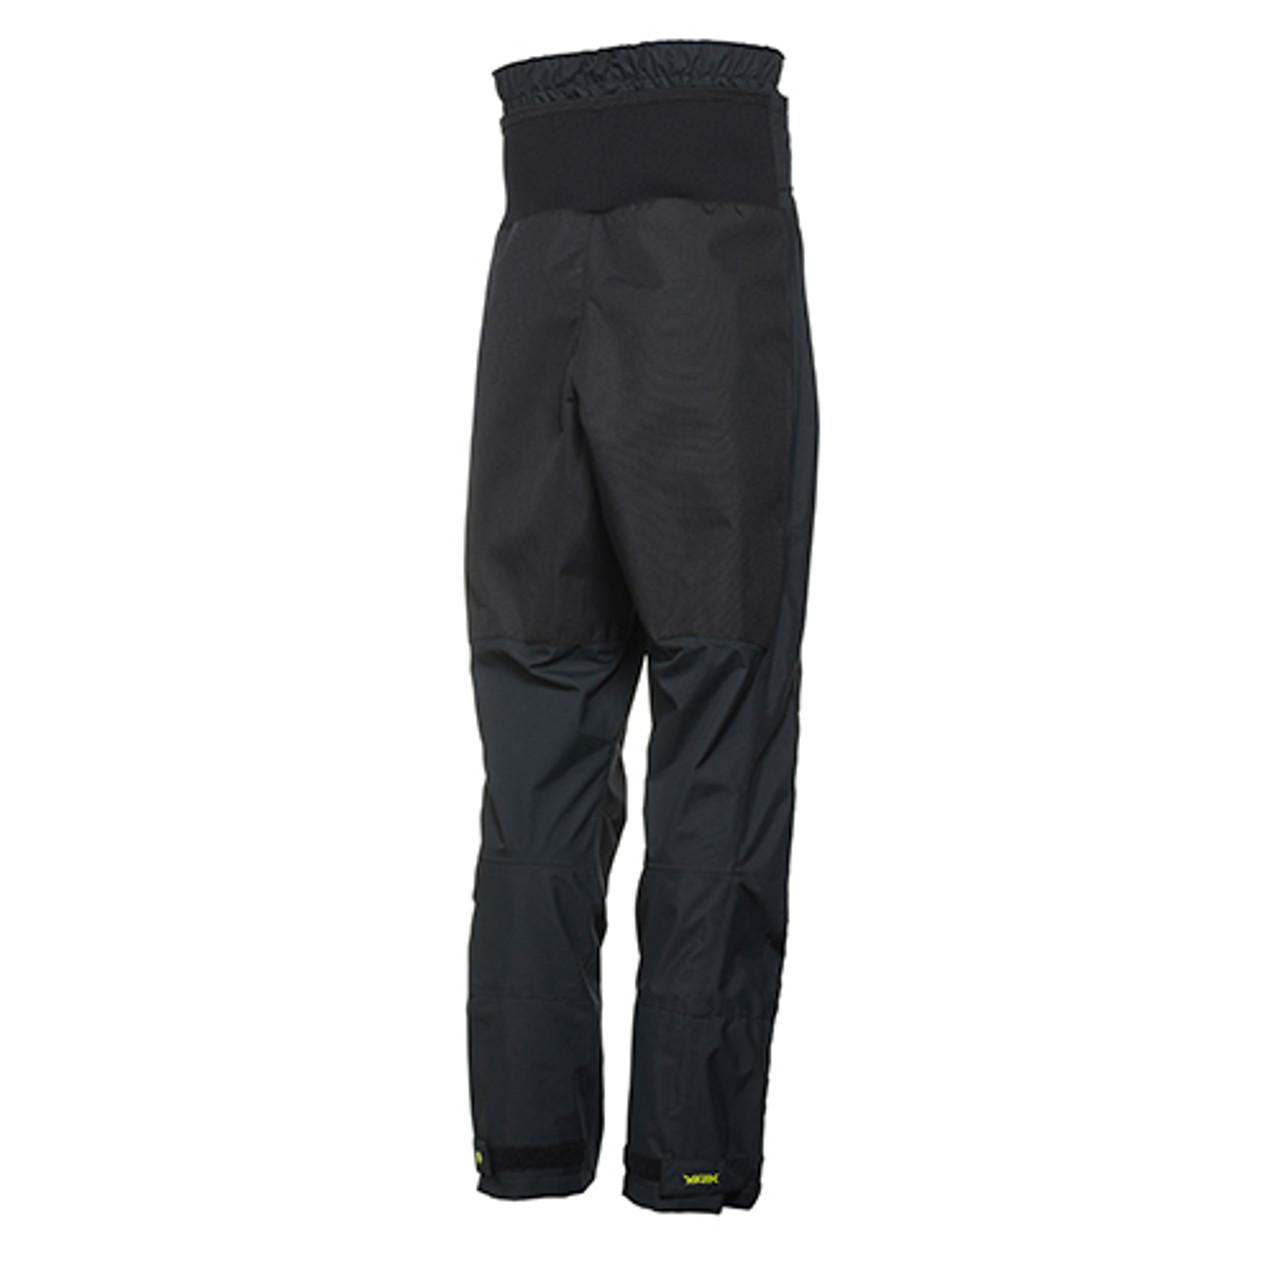 Yak dry pants - back